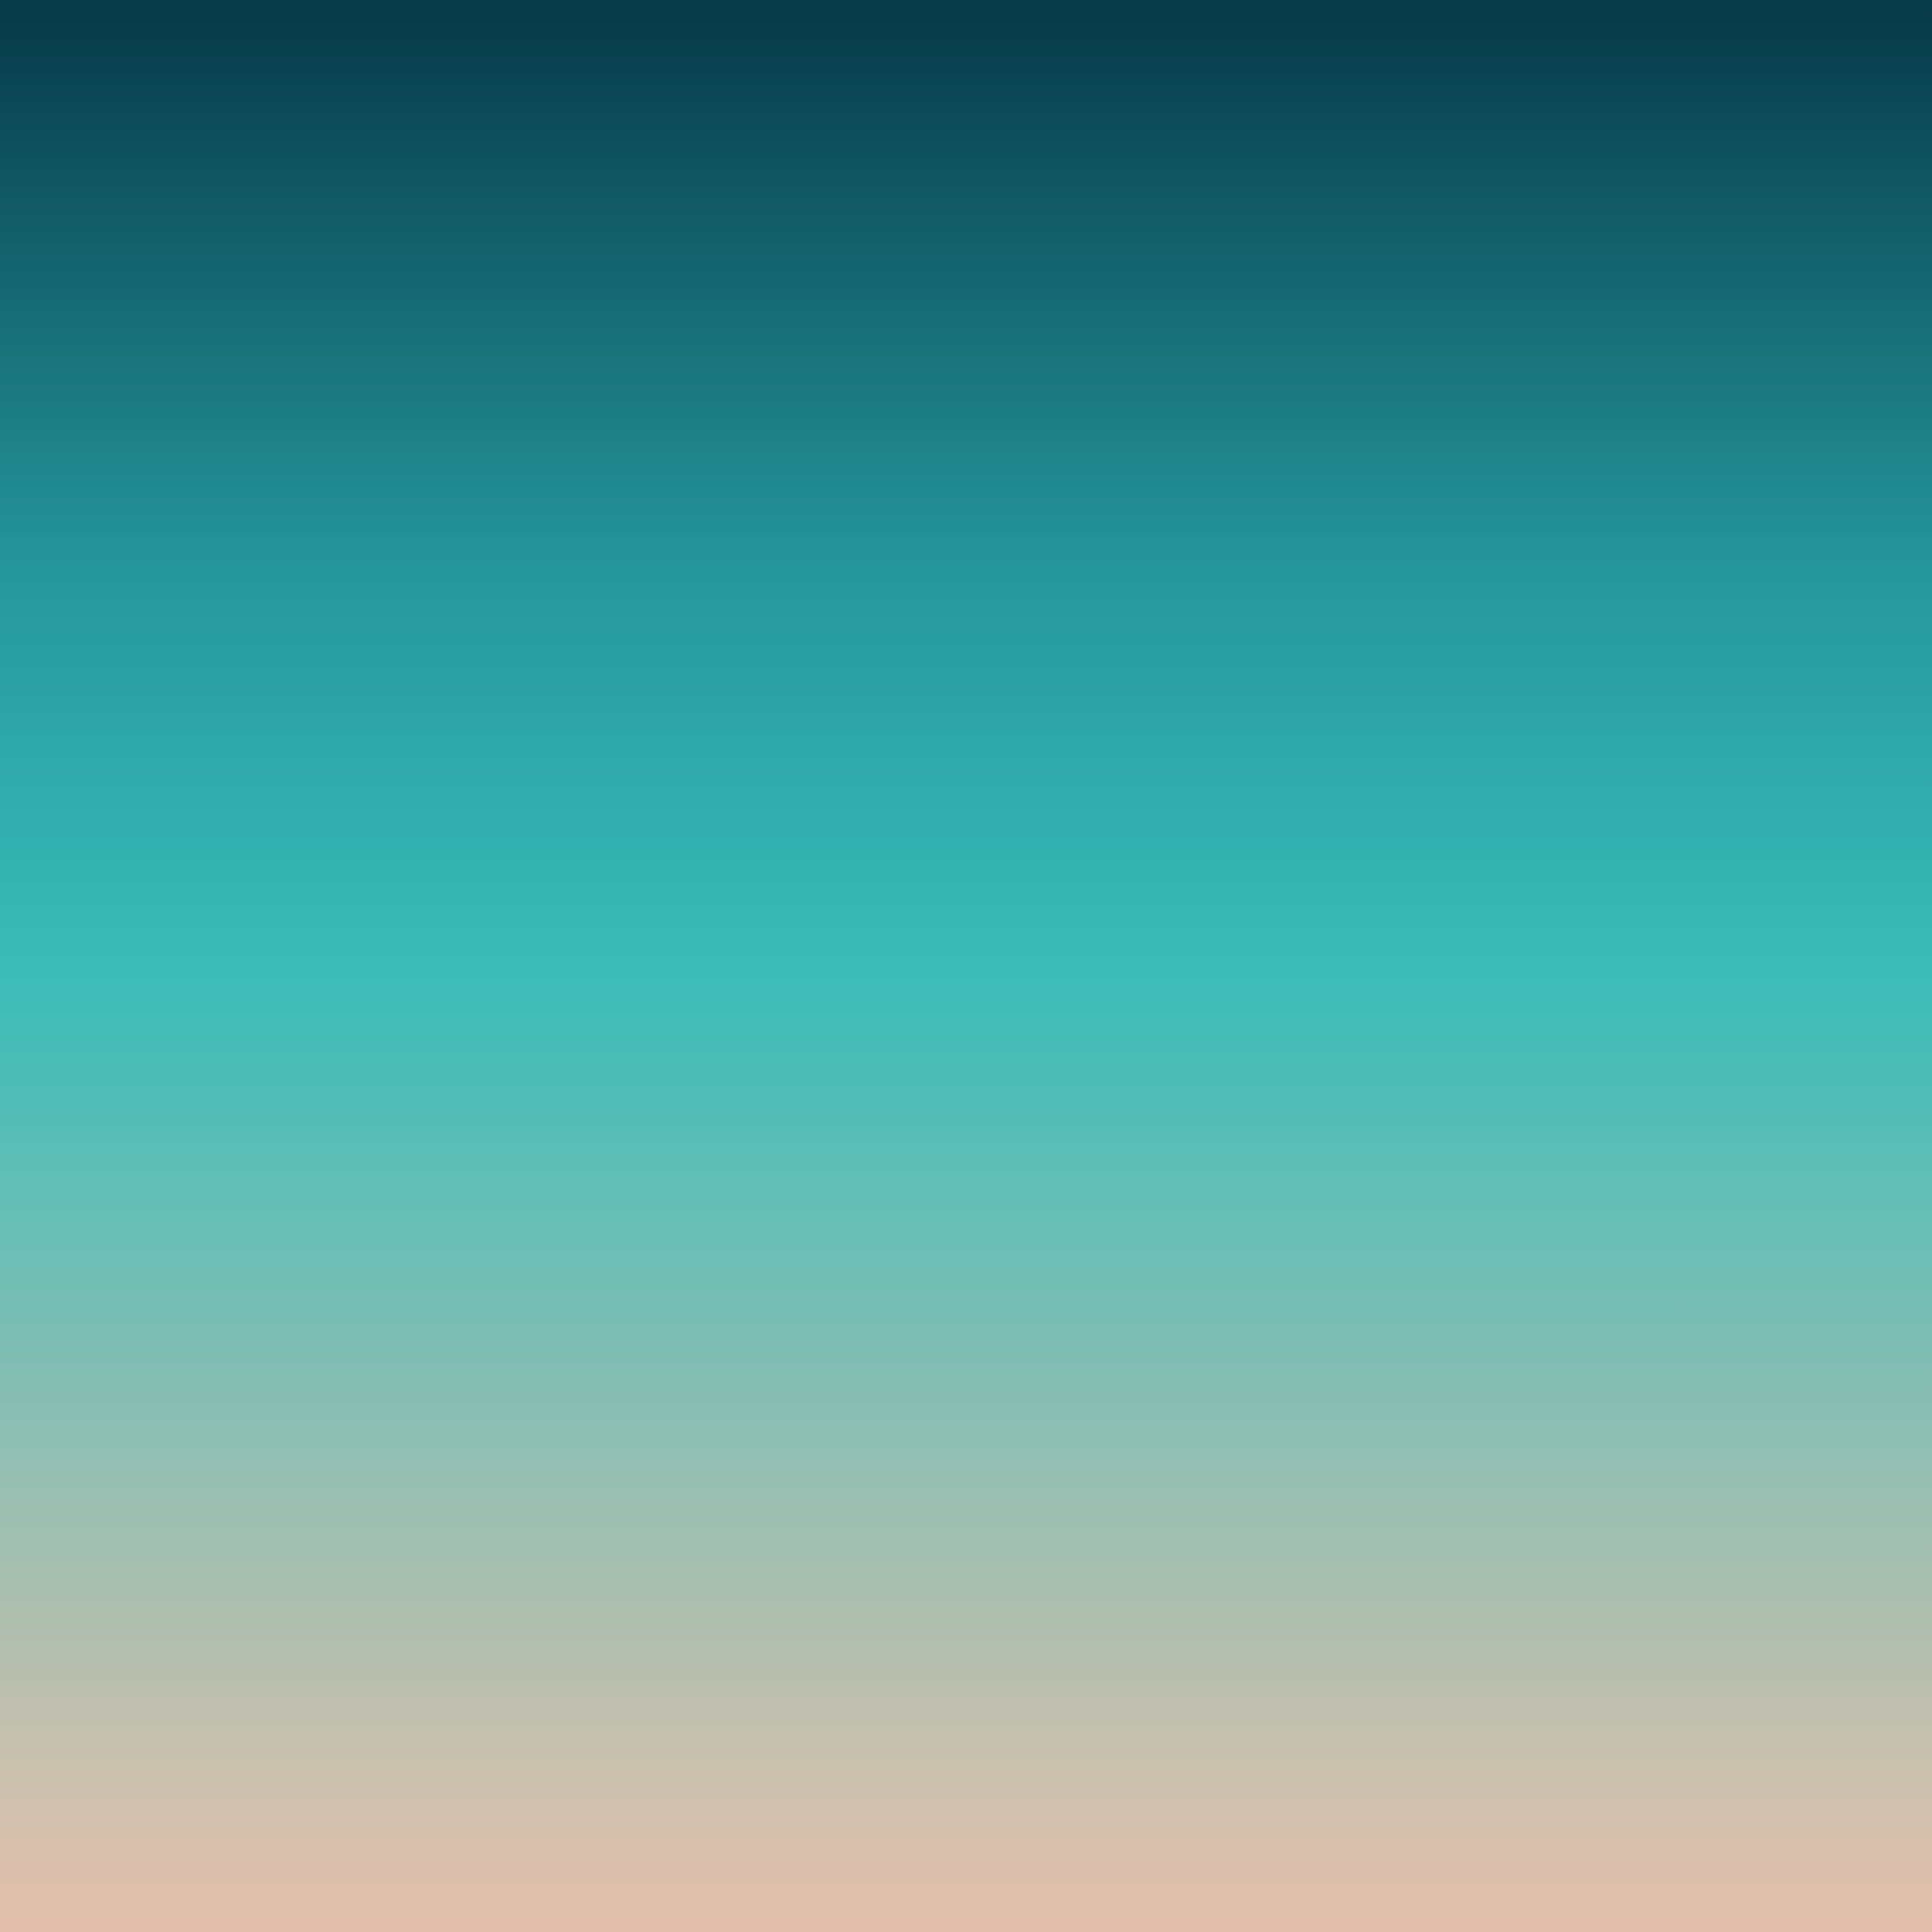 Apple Car Wallpaper Sl25 Iphone8 Ios11 Blue Background Apple Blur Gradation